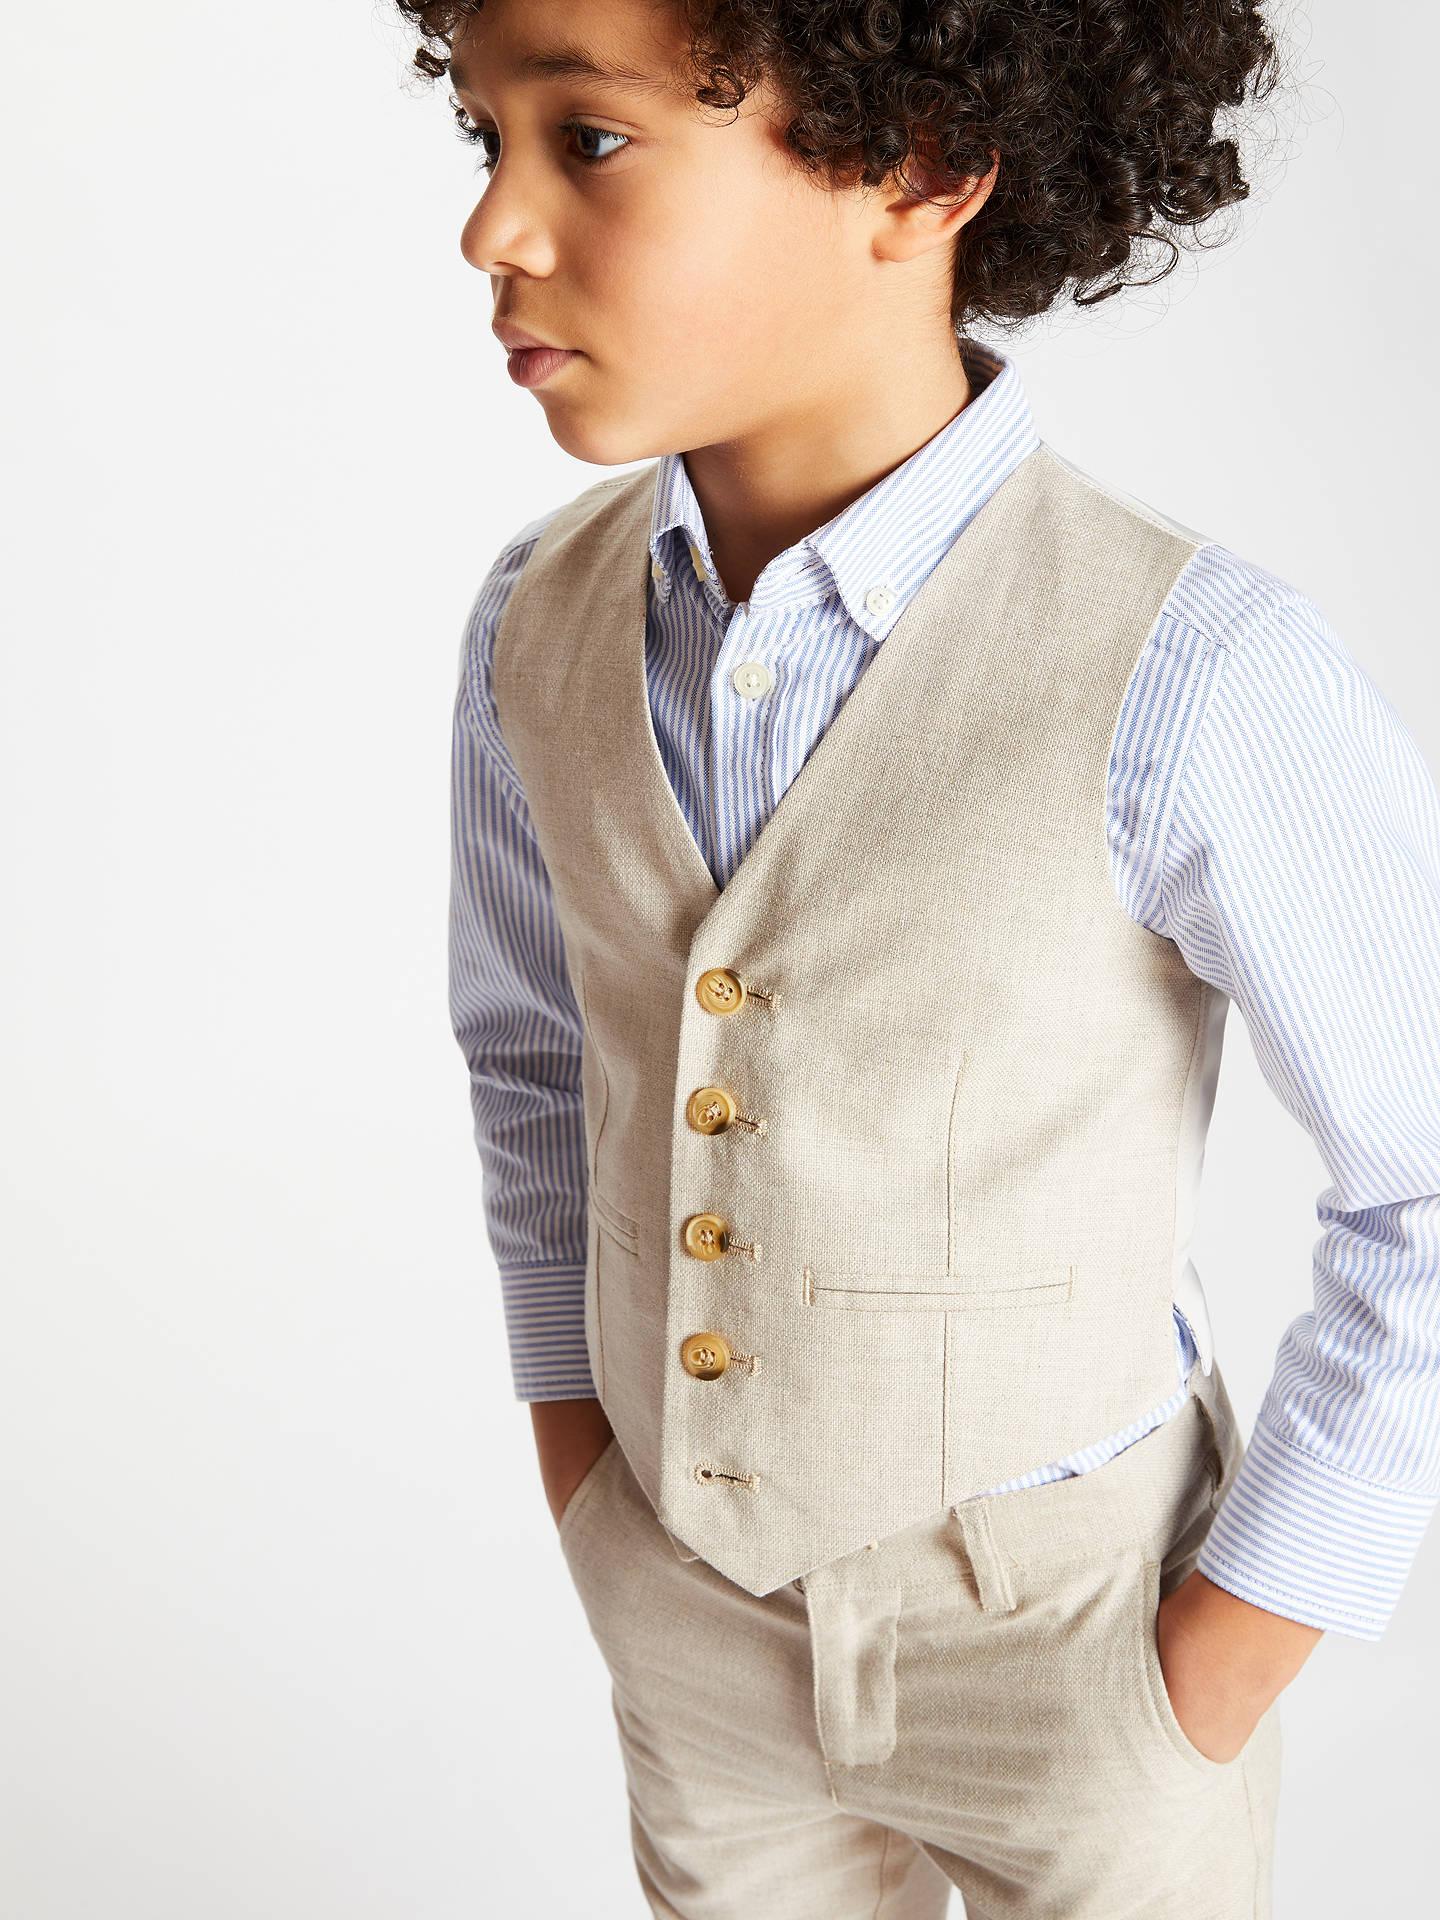 088c3b82a8308 John Lewis & Partners Heirloom Collection Boys' Linen Suit Waistcoat ...